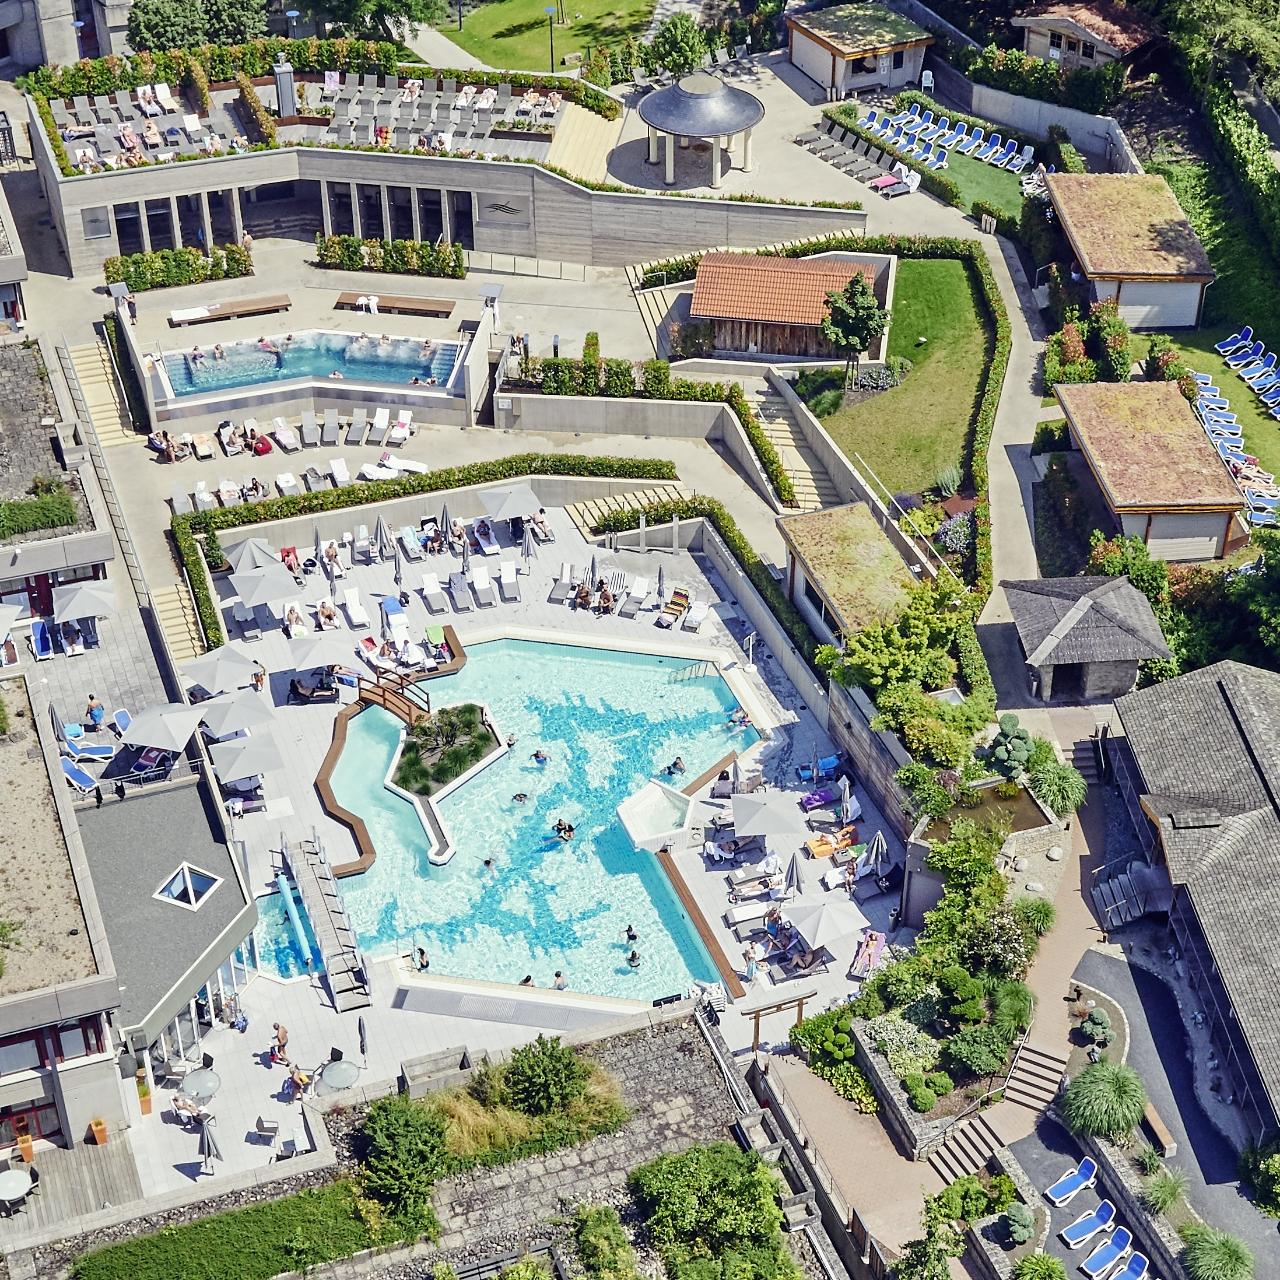 Hotel Villa Welcome Full Spa Access 3 Hrs Star Hotel In Mondorf